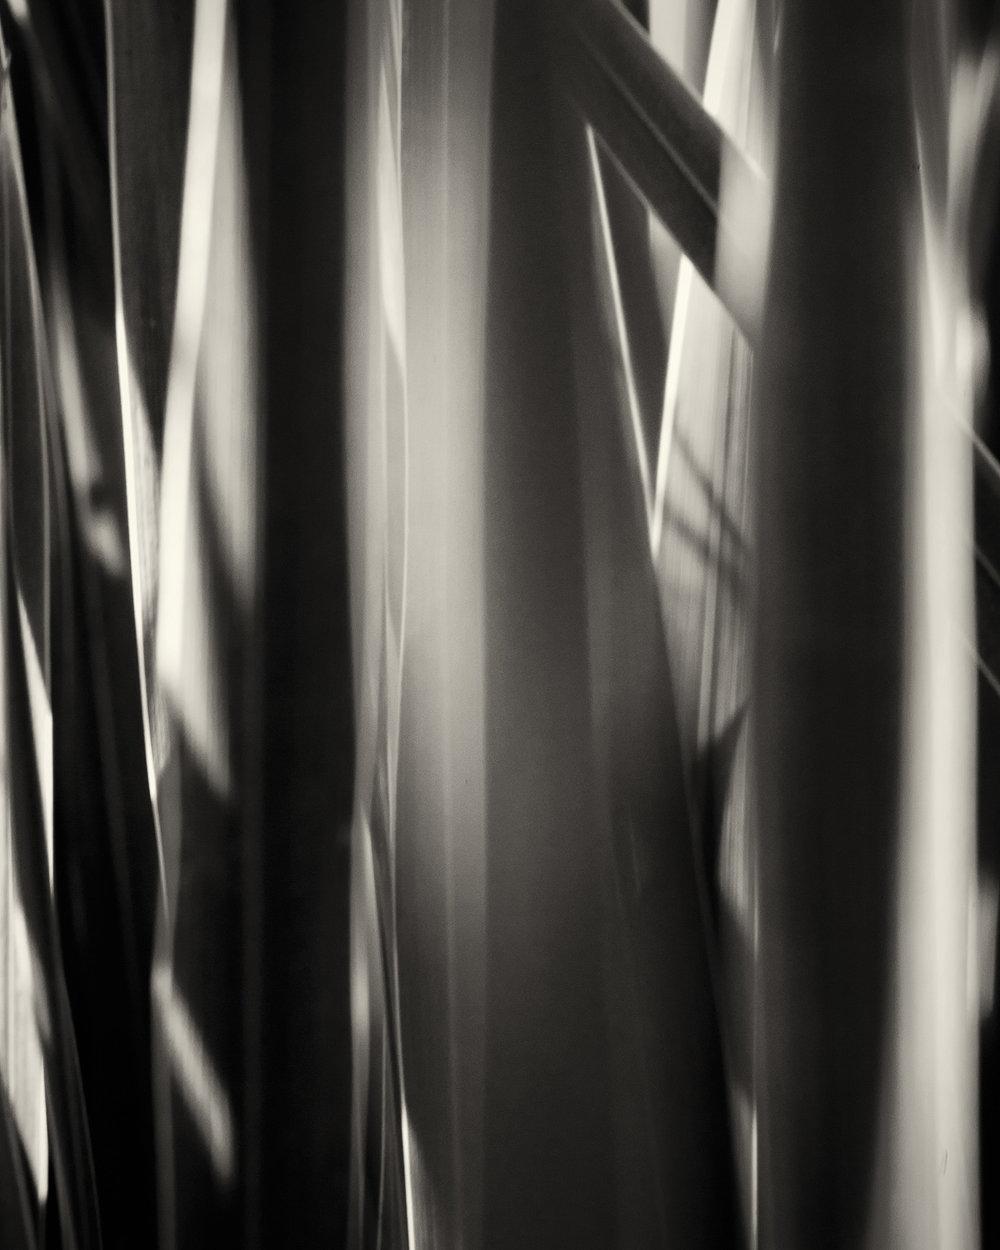 1 Iris Leaves 1 Abstract Interior Design M Decor - affordable art